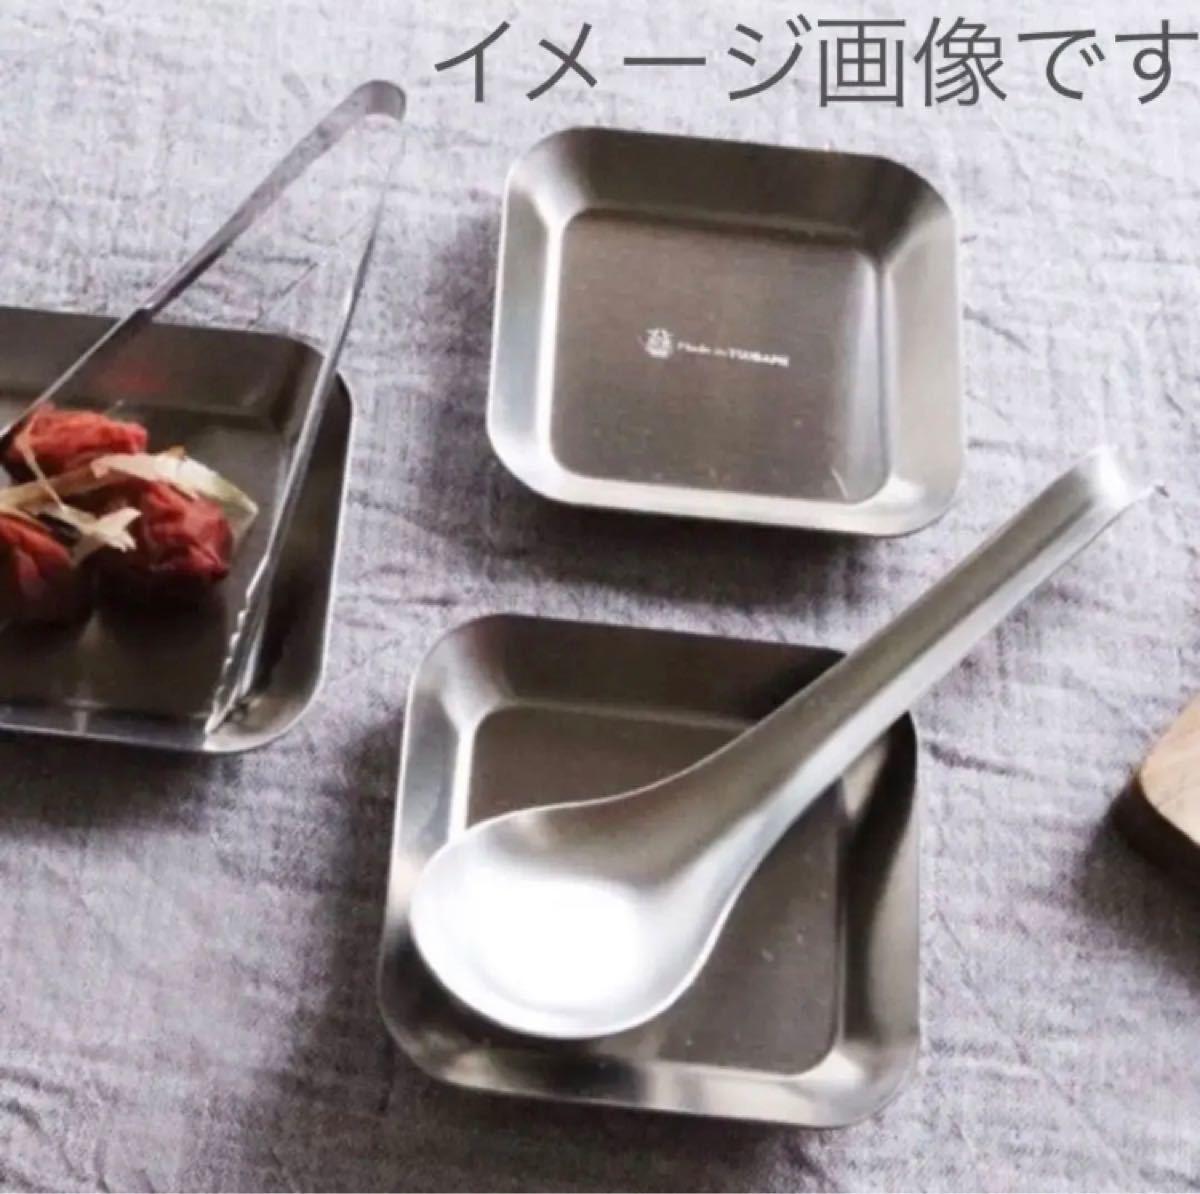 Made in TSUBAME薬味小皿 新品 日本製 新潟県燕三条 刻印入り